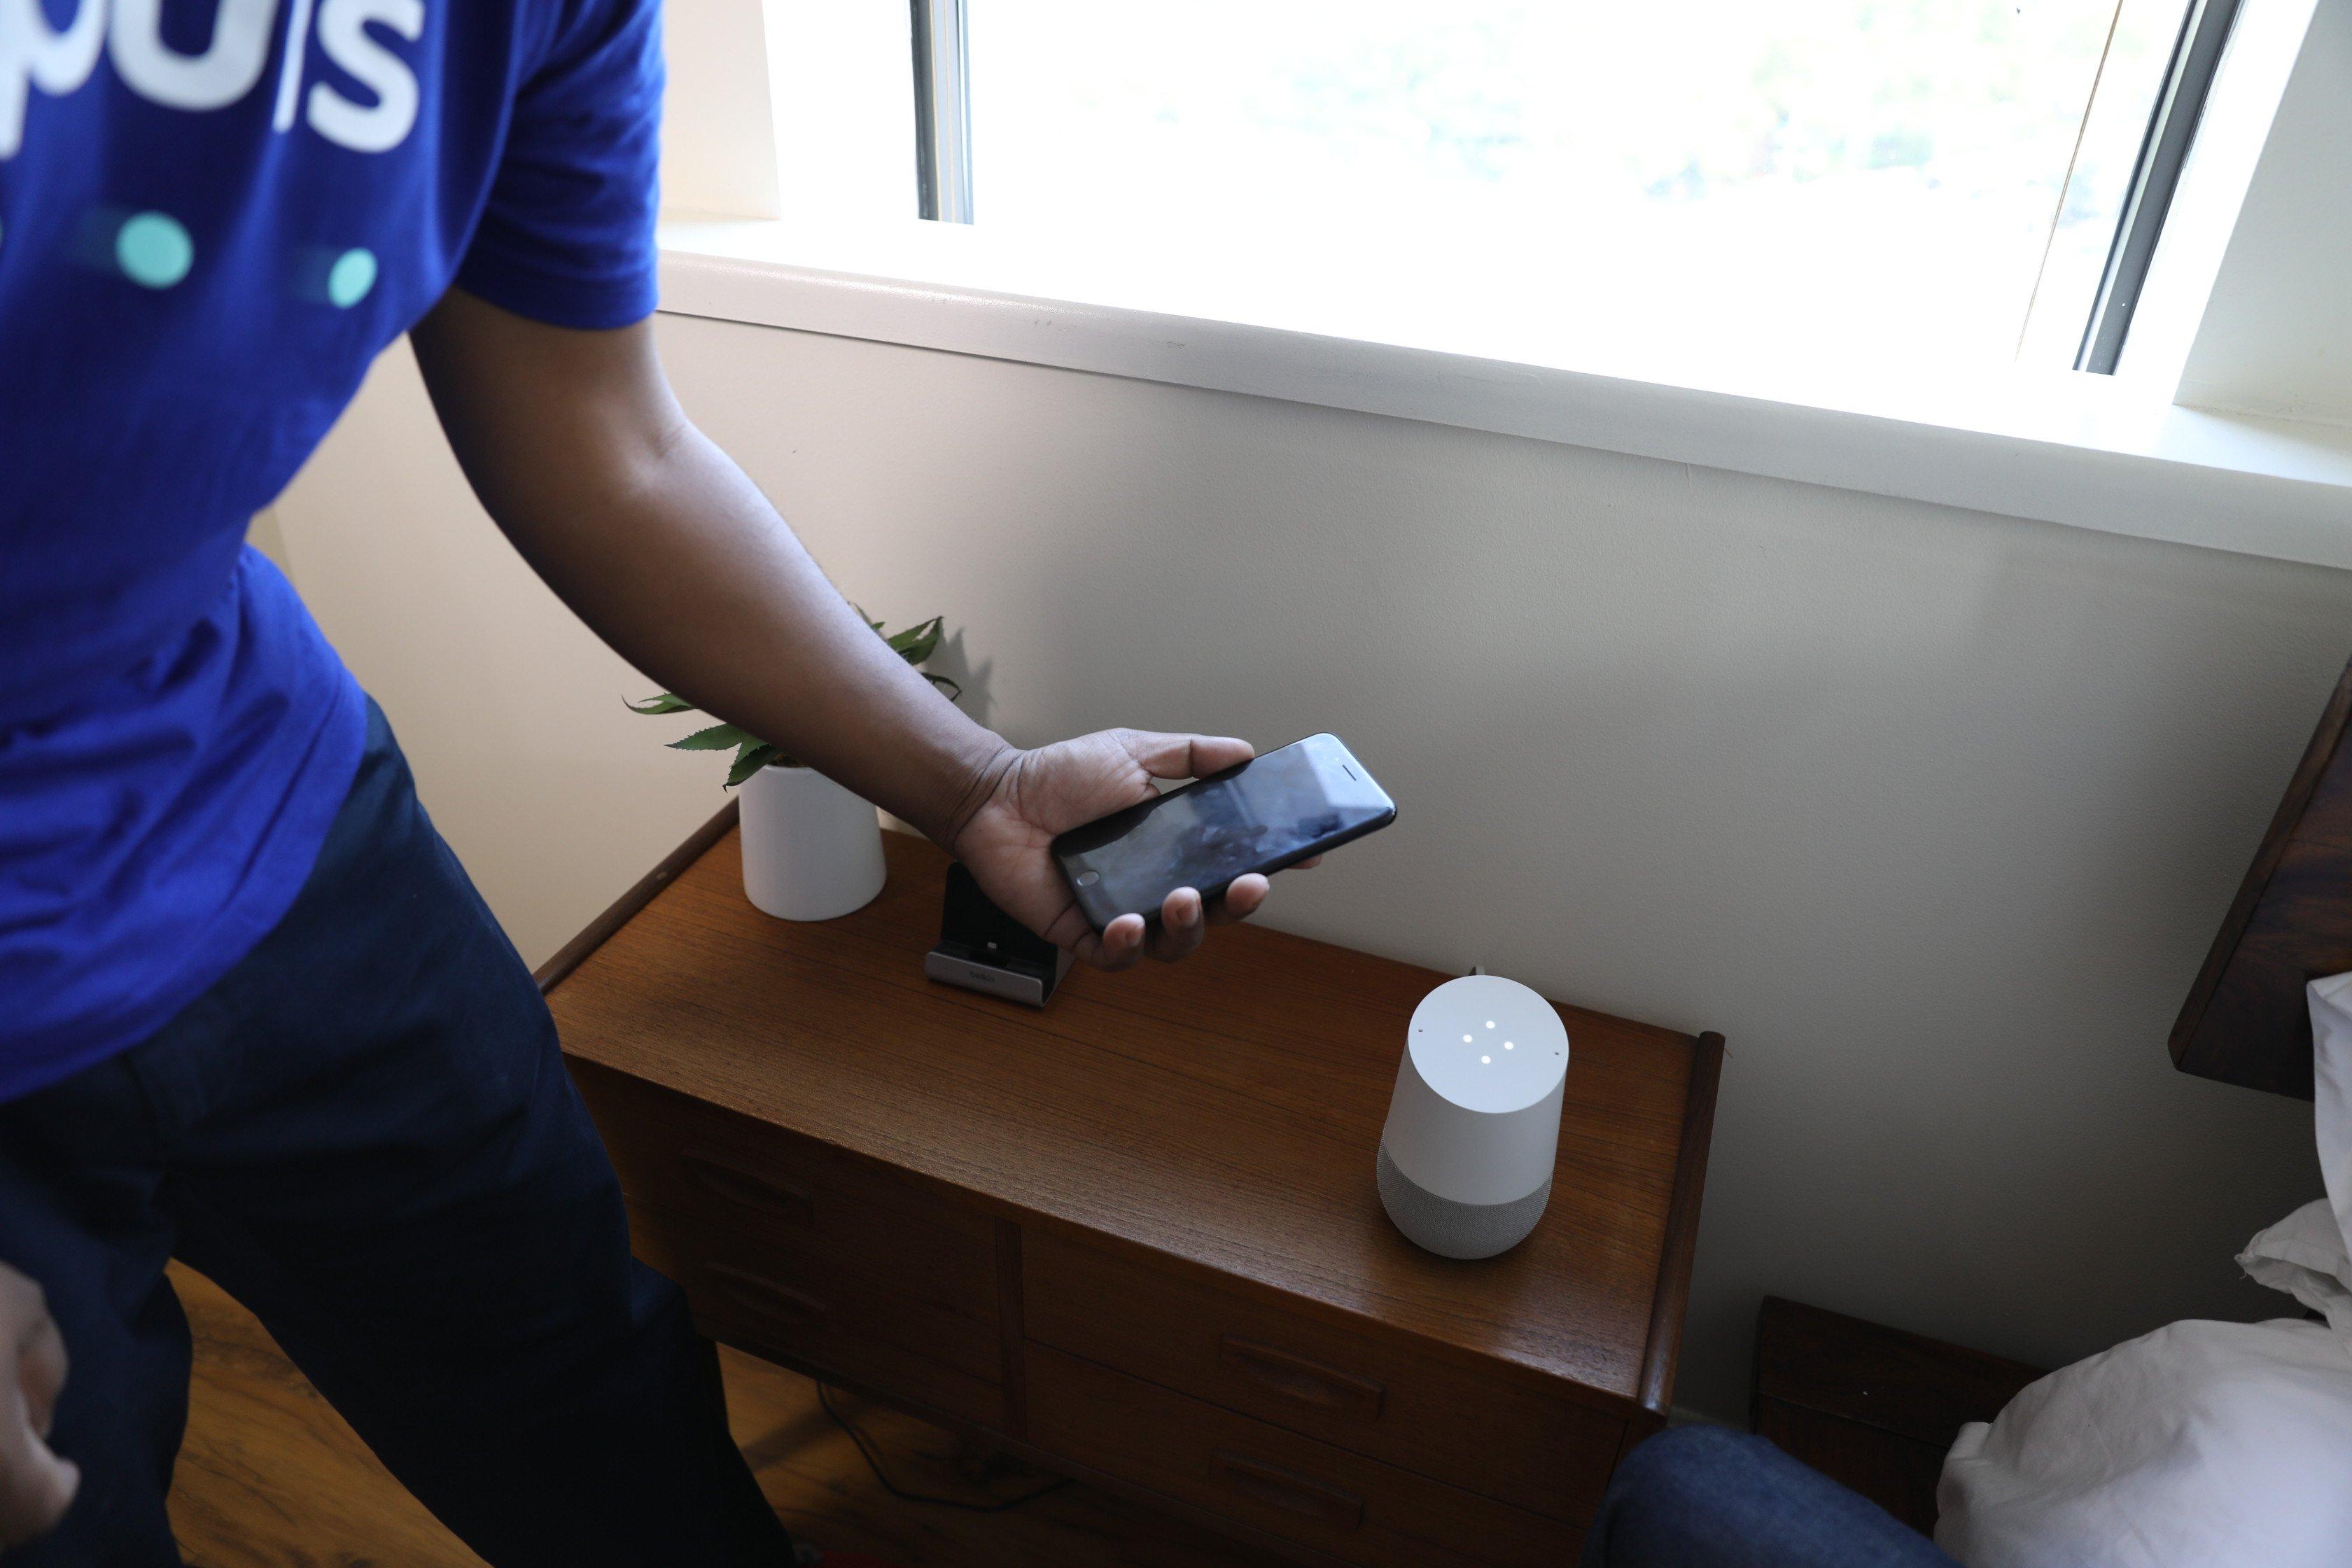 Puls technician demonstrating Google Home